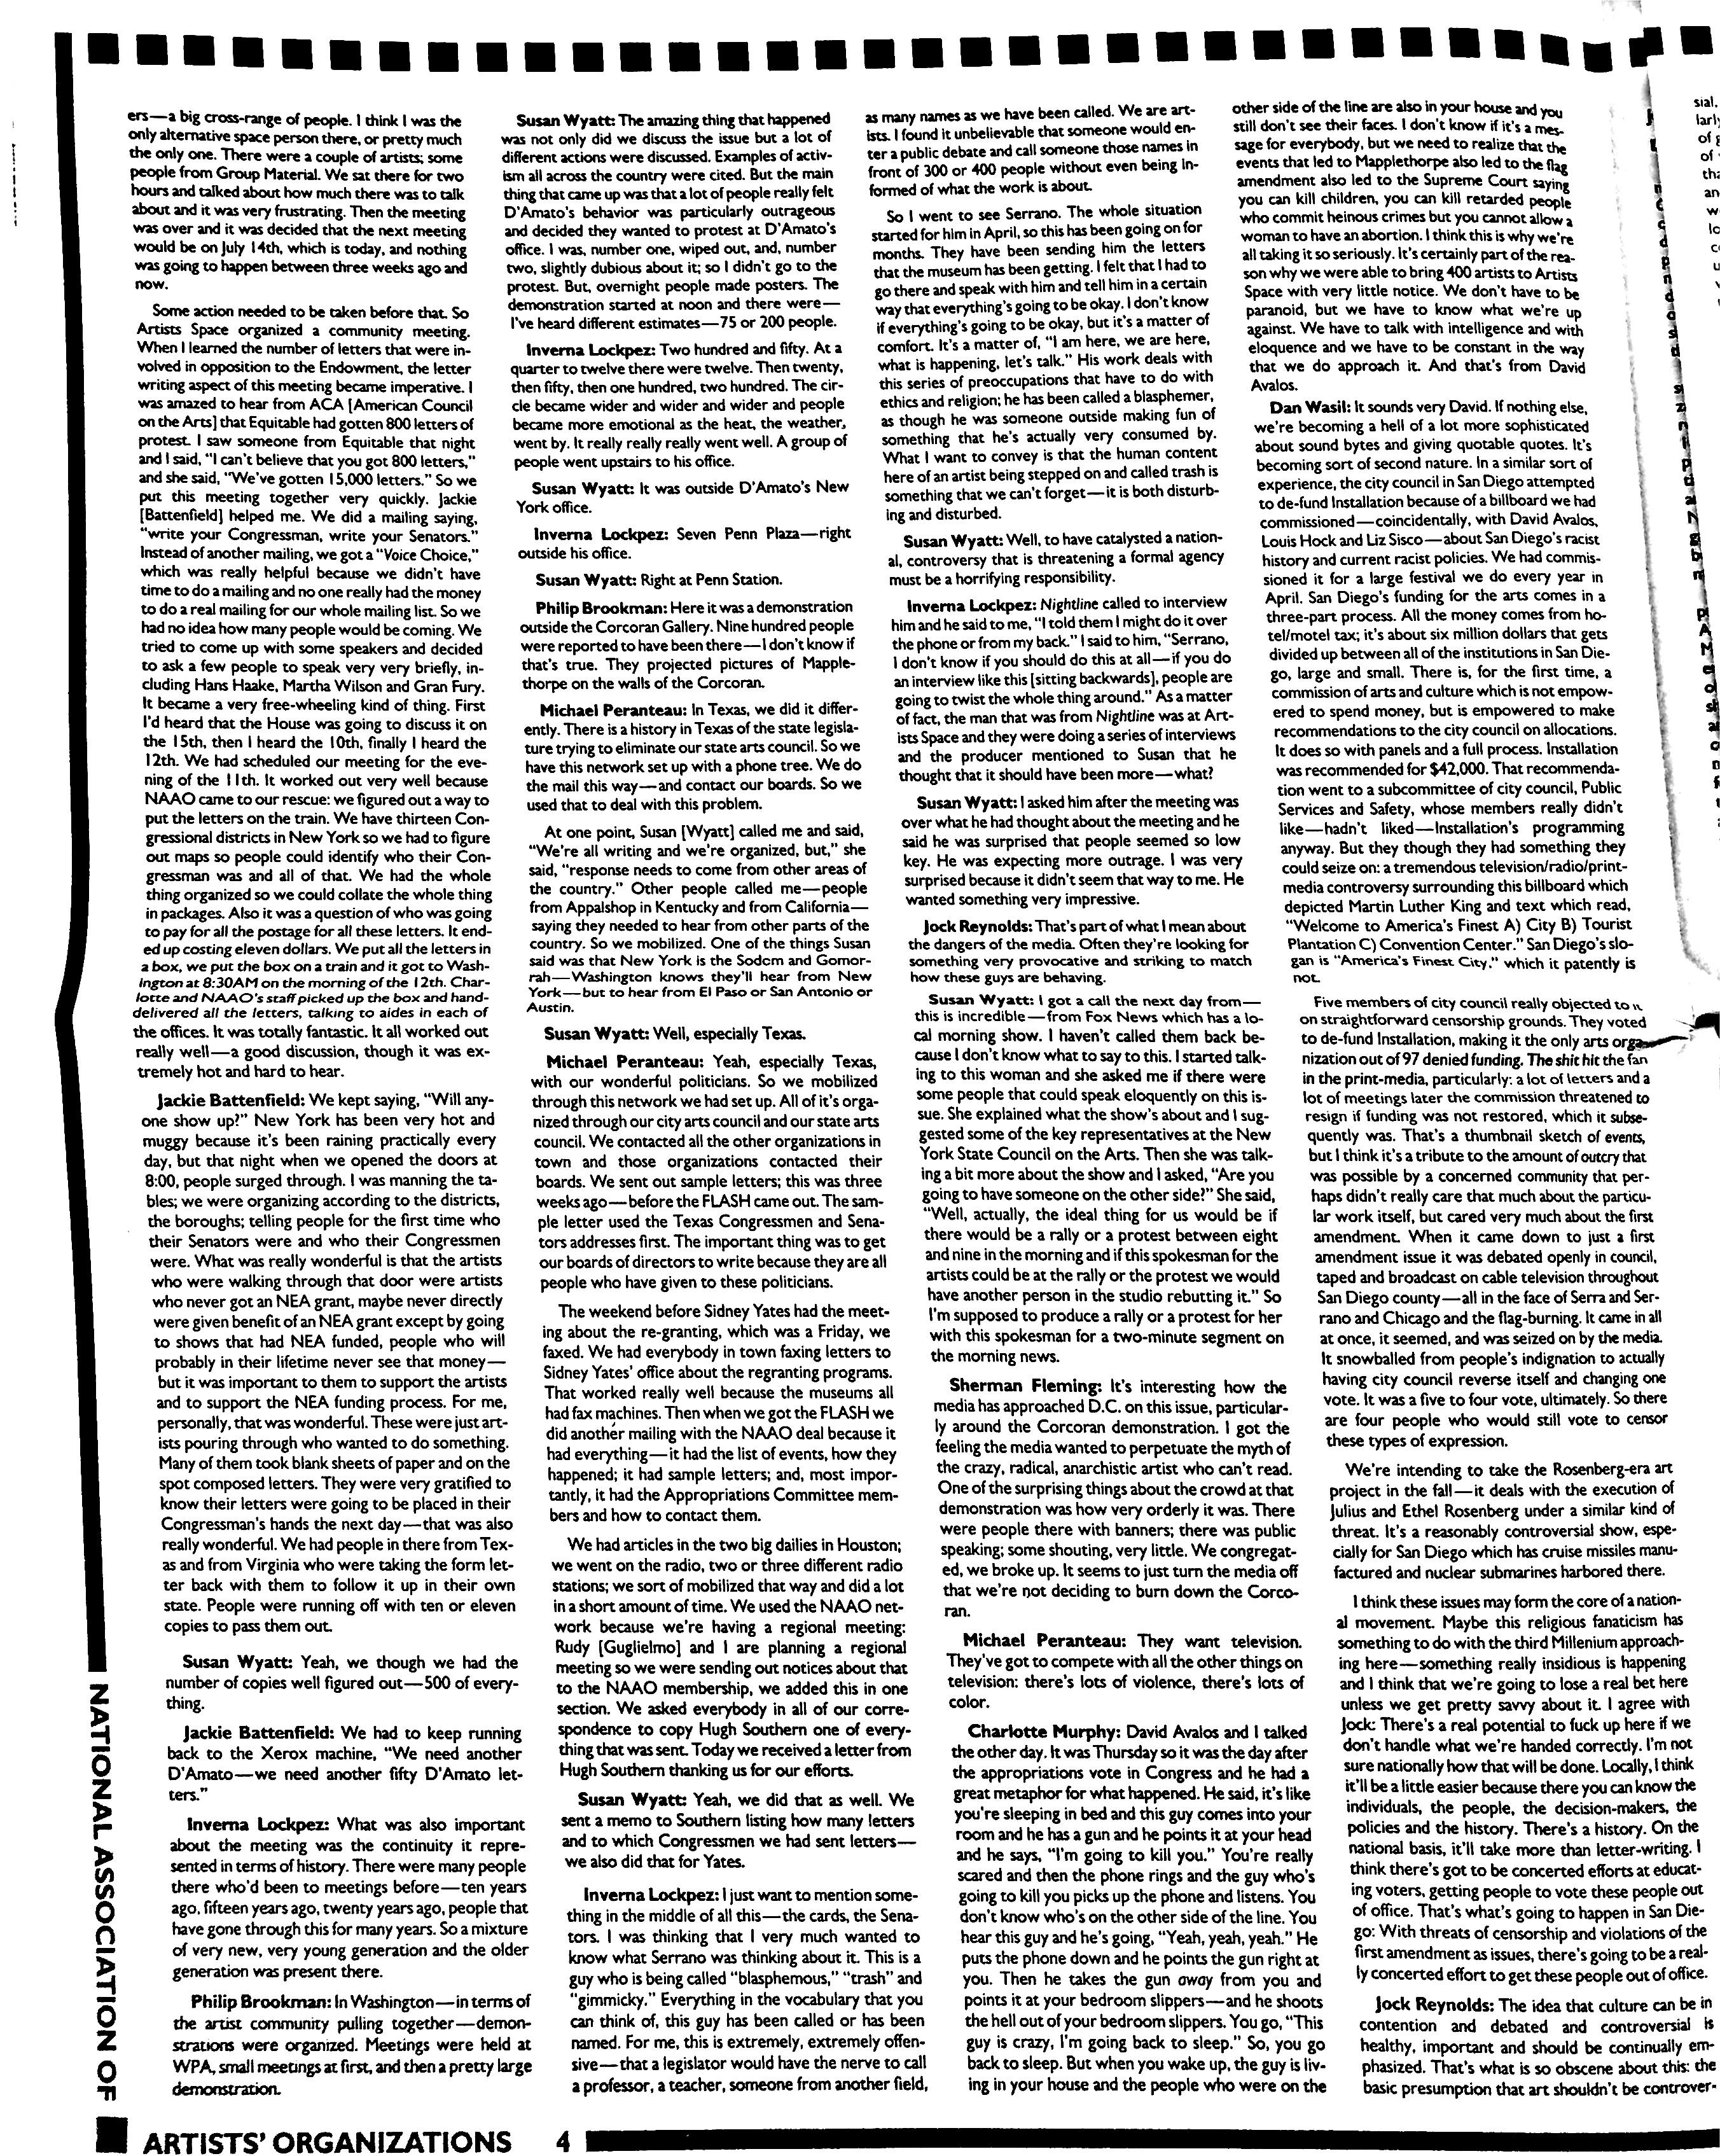 August 1989 - NAAO Bulletin Page 5.jpg